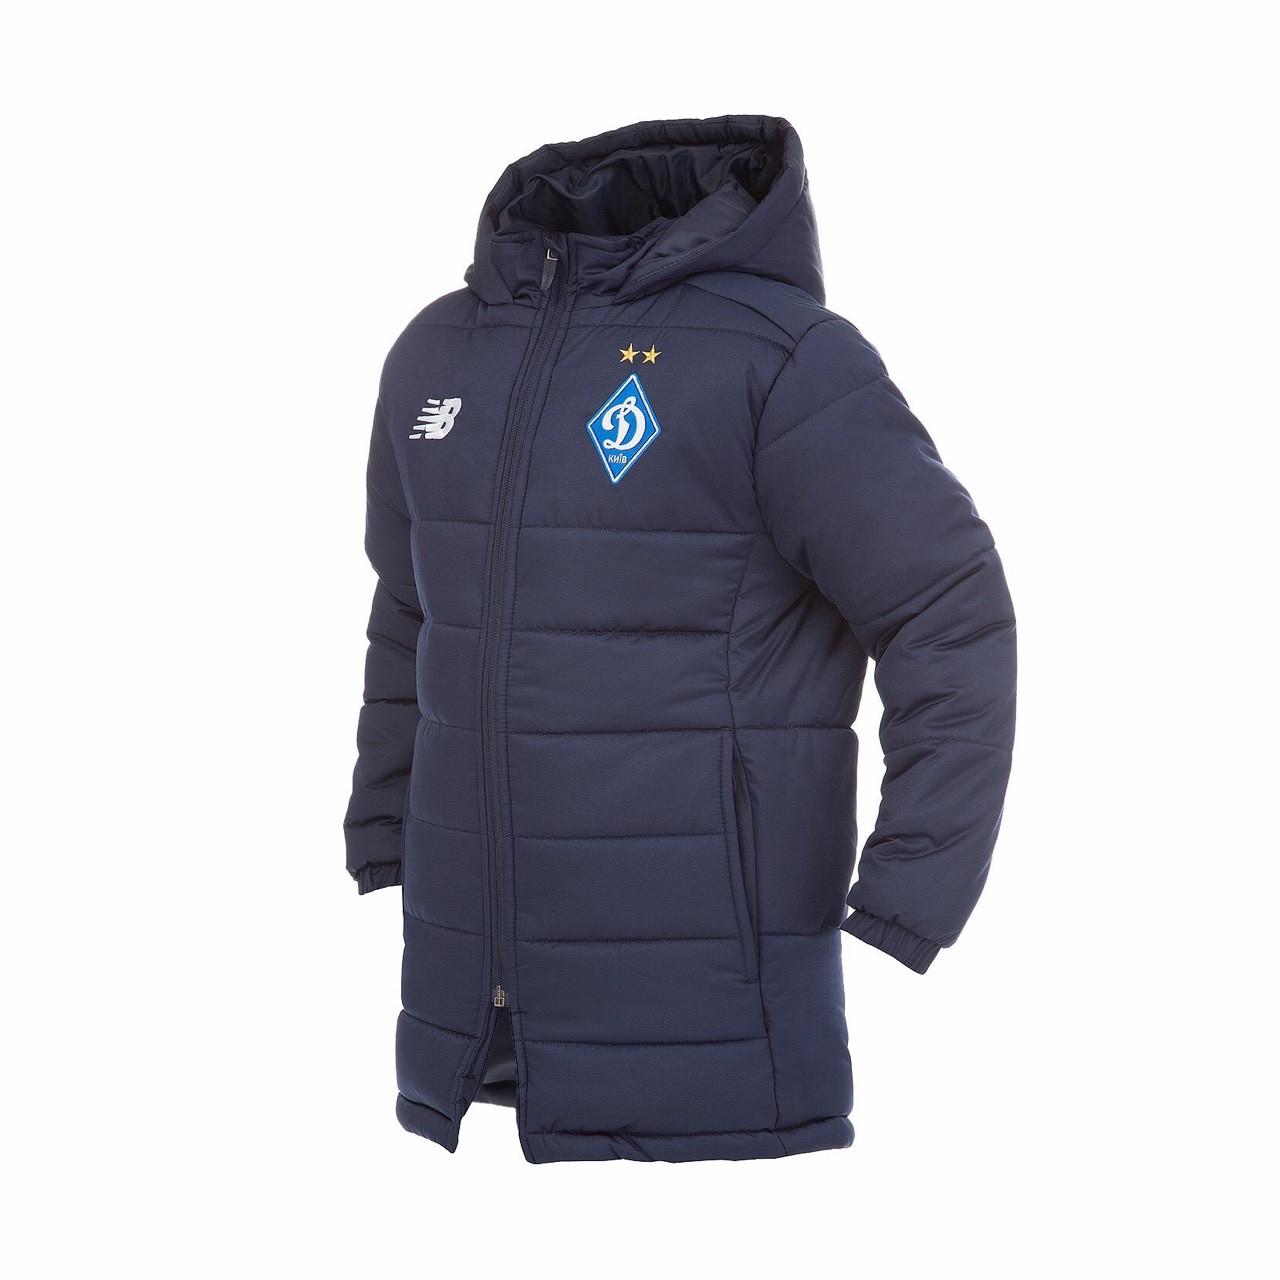 Зимняя куртка мужская New Balance ФК Динамо Киев